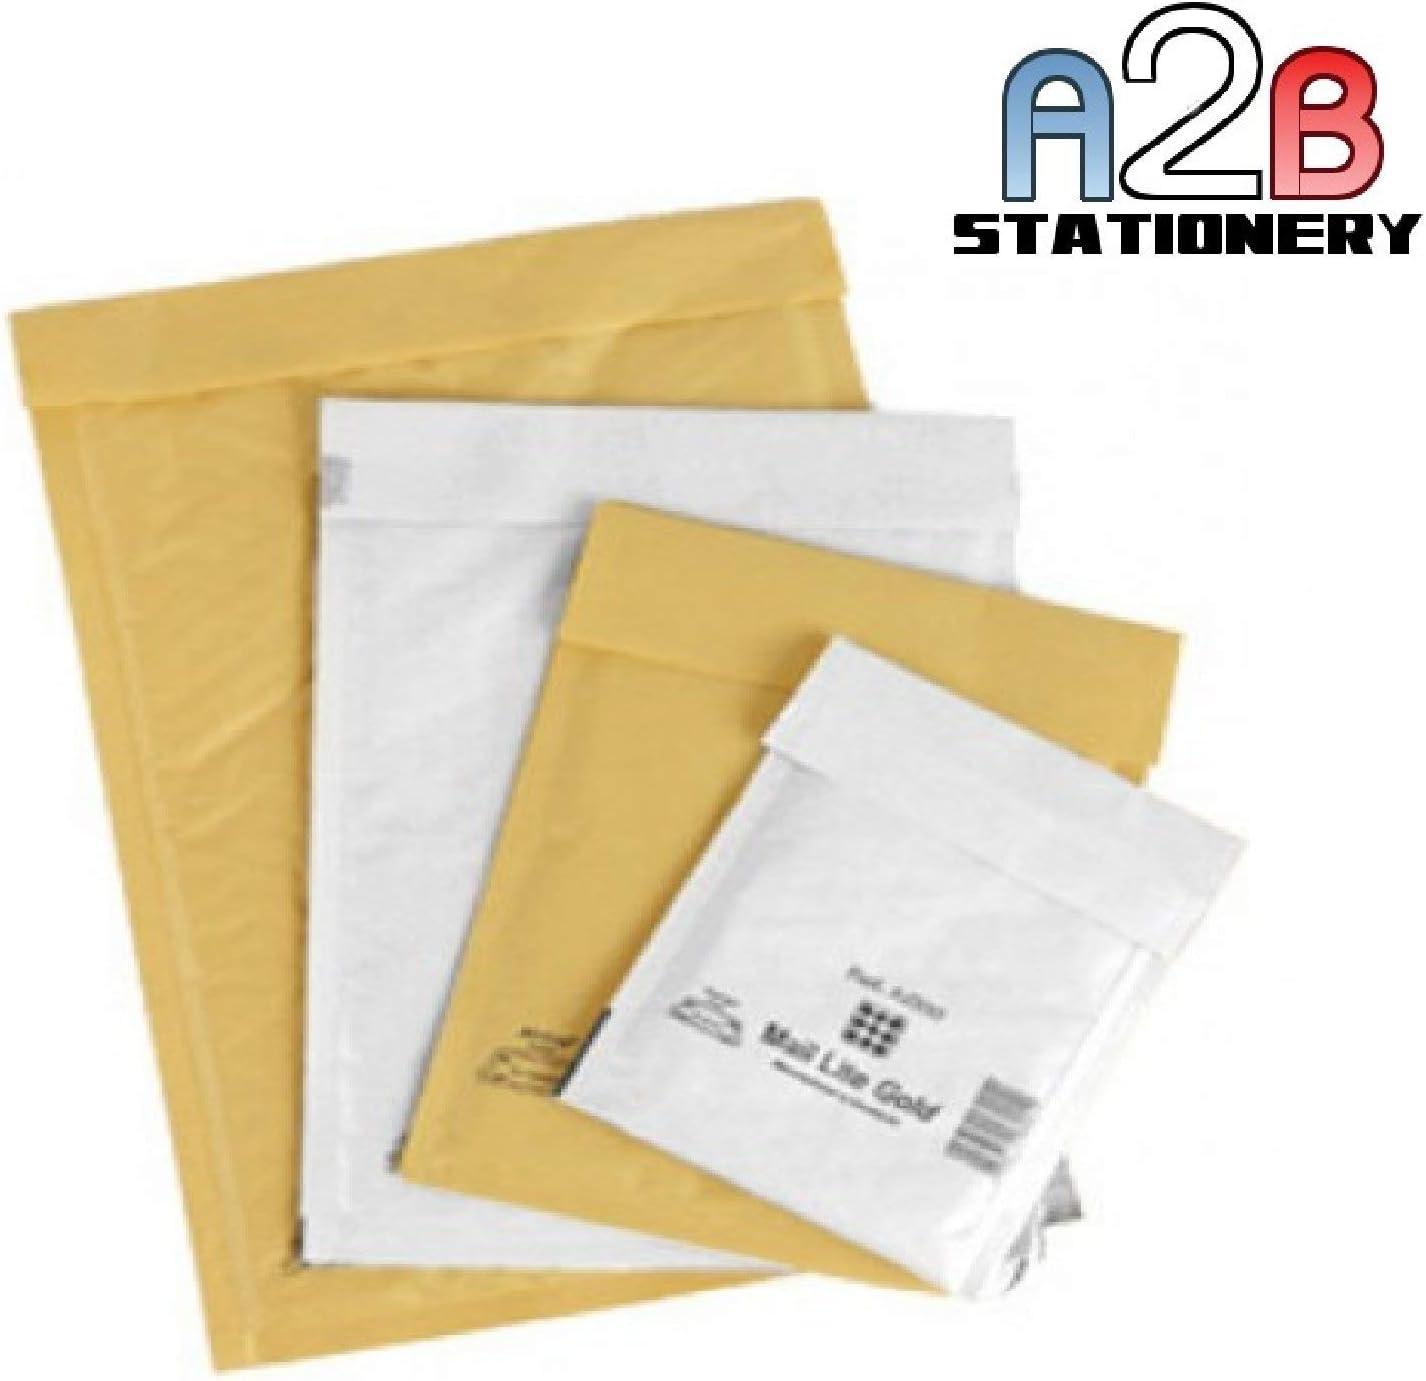 10 x JL6 J//6 White Padded Bubble Bags Envelopes 290x445mm EP9